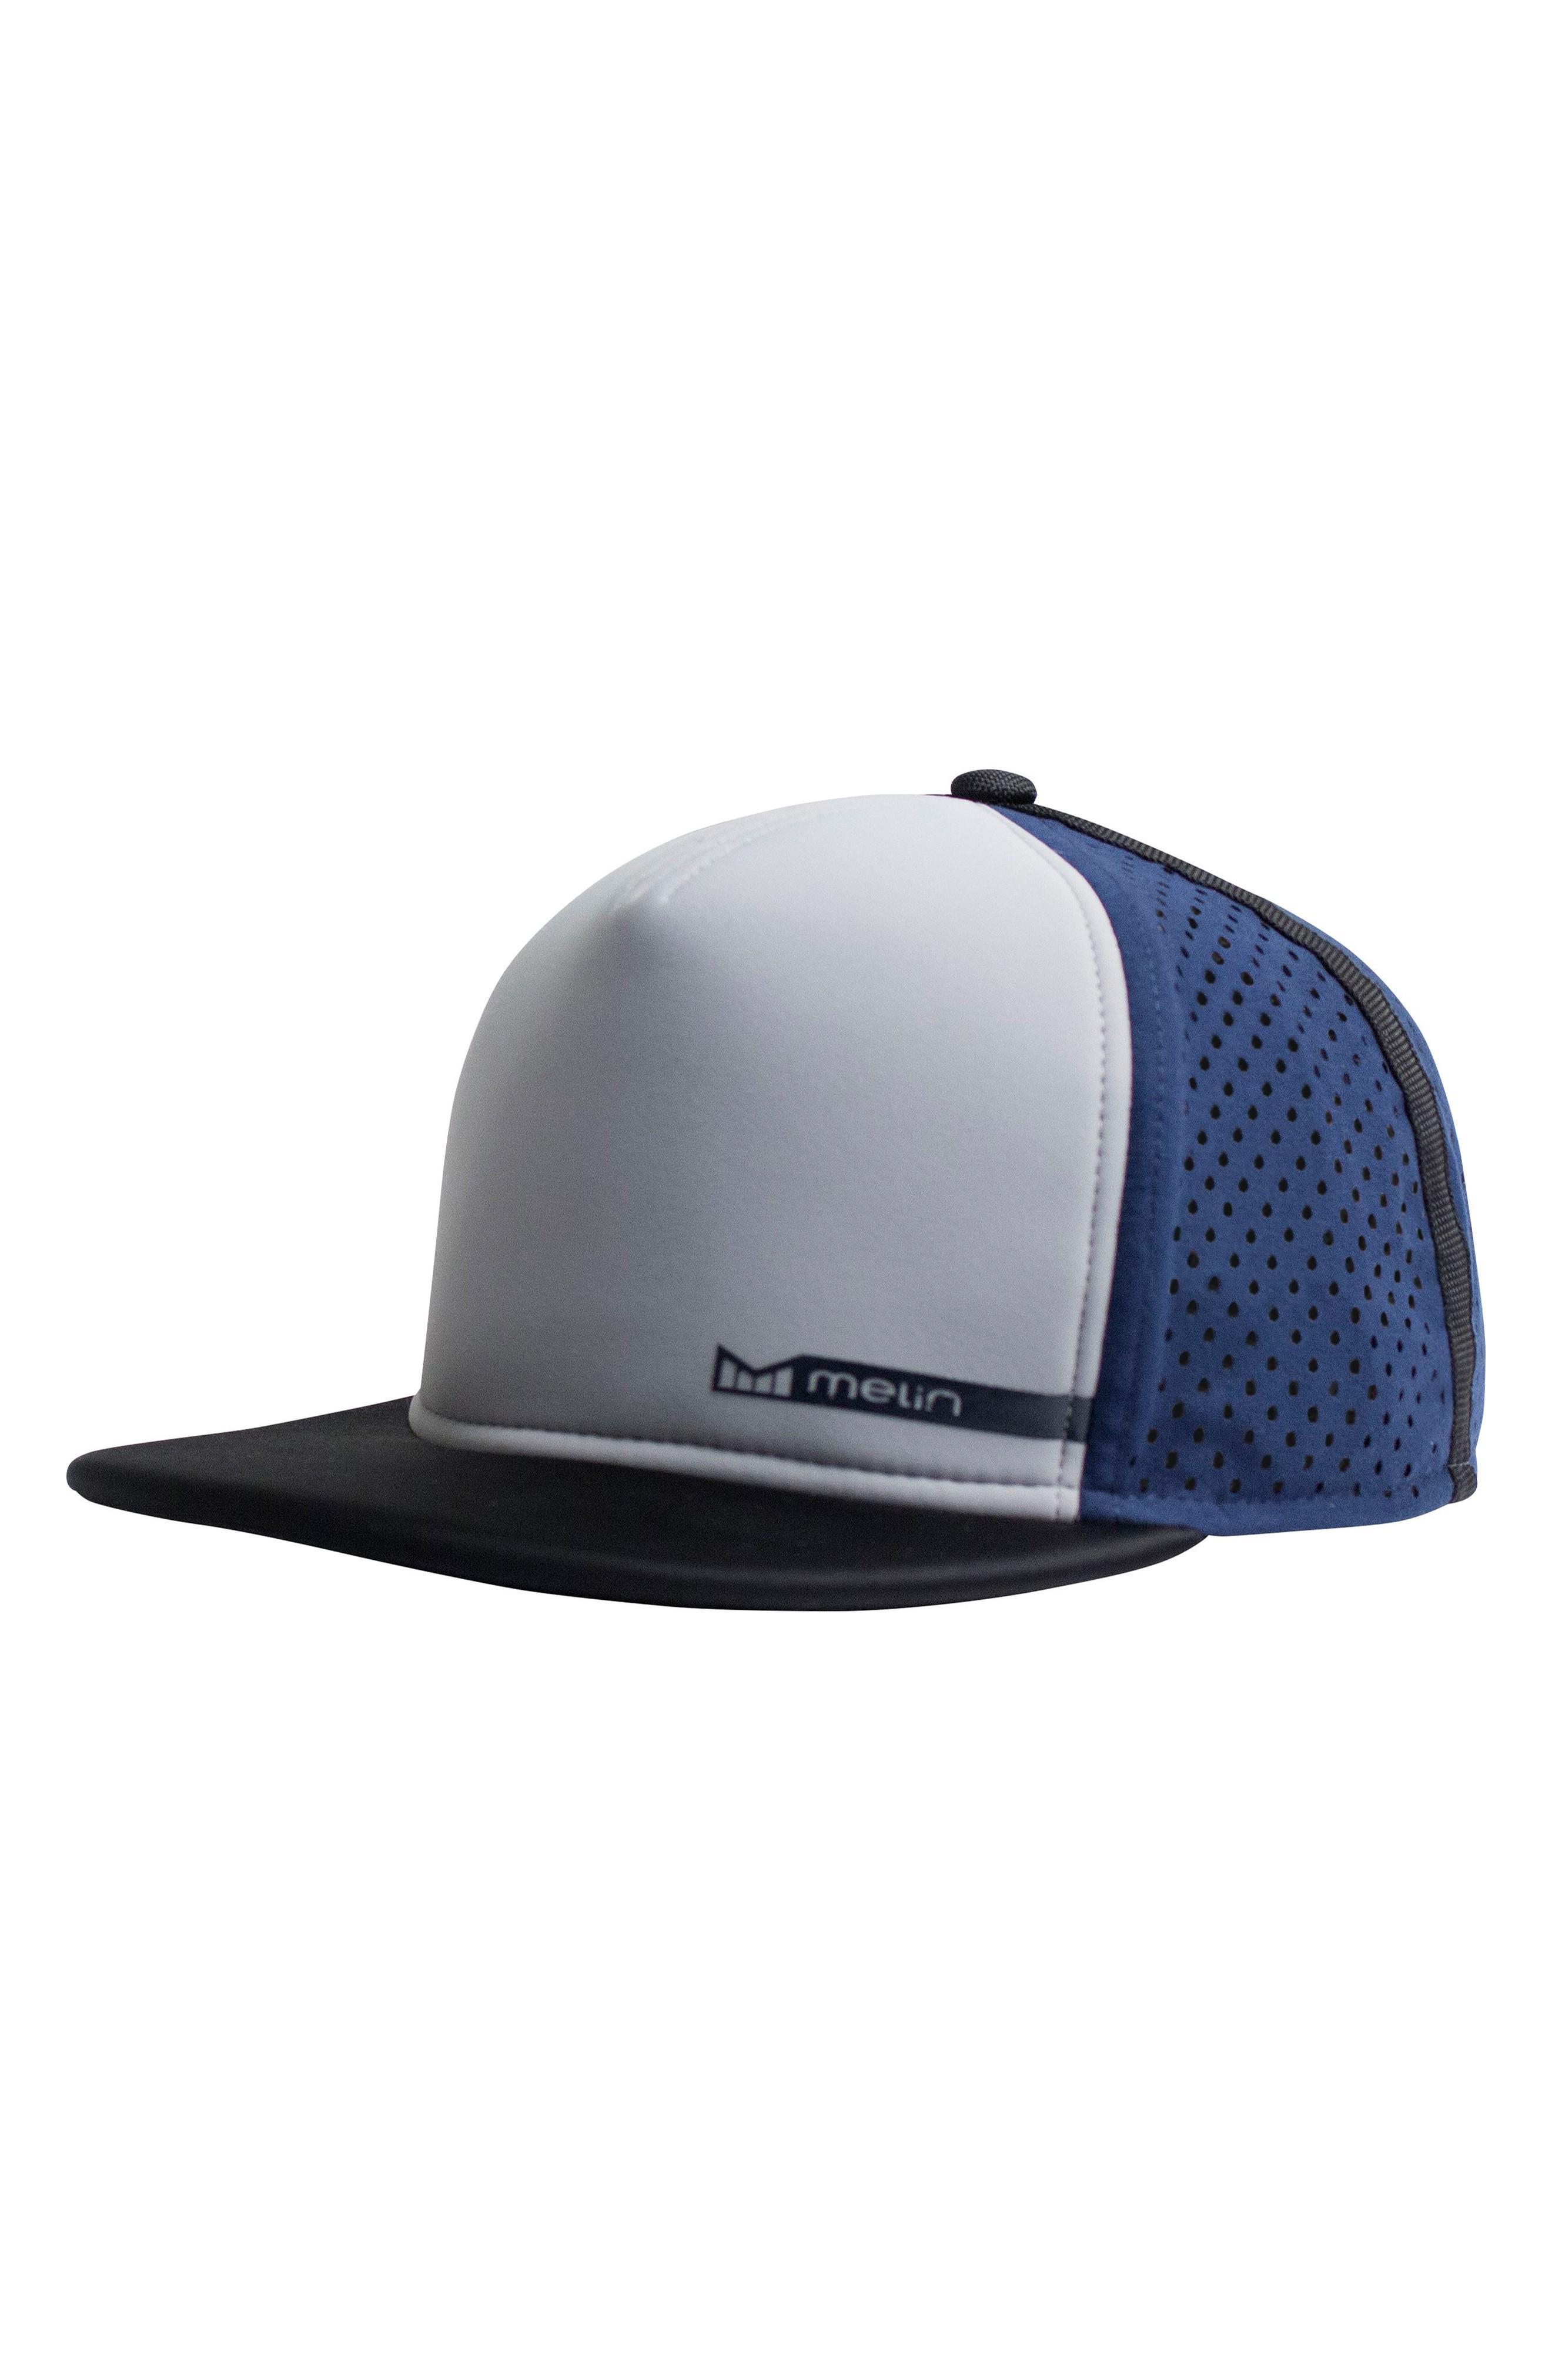 f14e04deb 'Amphibian' Split Fit Snapback Baseball Cap - Grey in Grey/ Blue